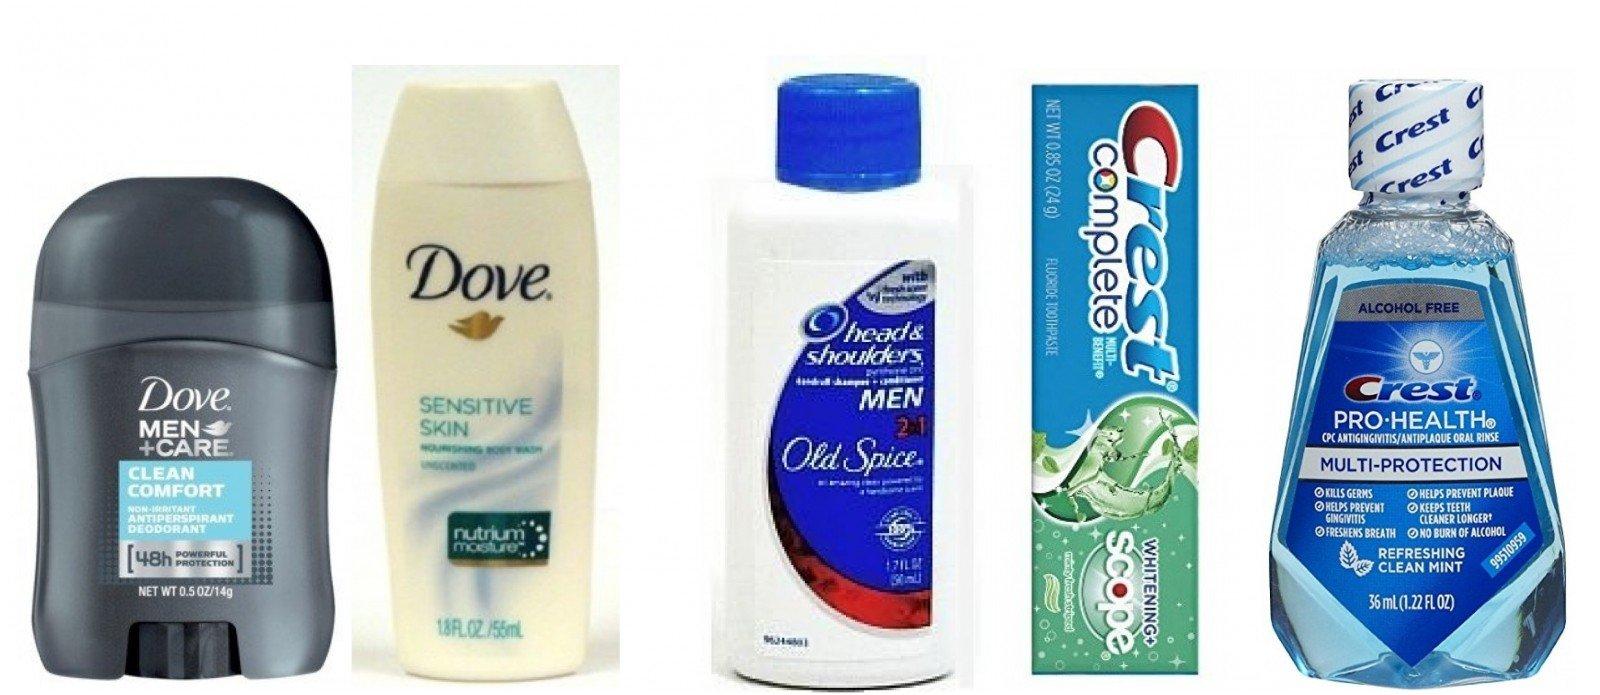 Dove Men Deodorant + Dove Sensitive Body Wash + Head Shoulders Old Spice Shampoo + Crest Toothpaste + Crest Mouthwash Travel Size